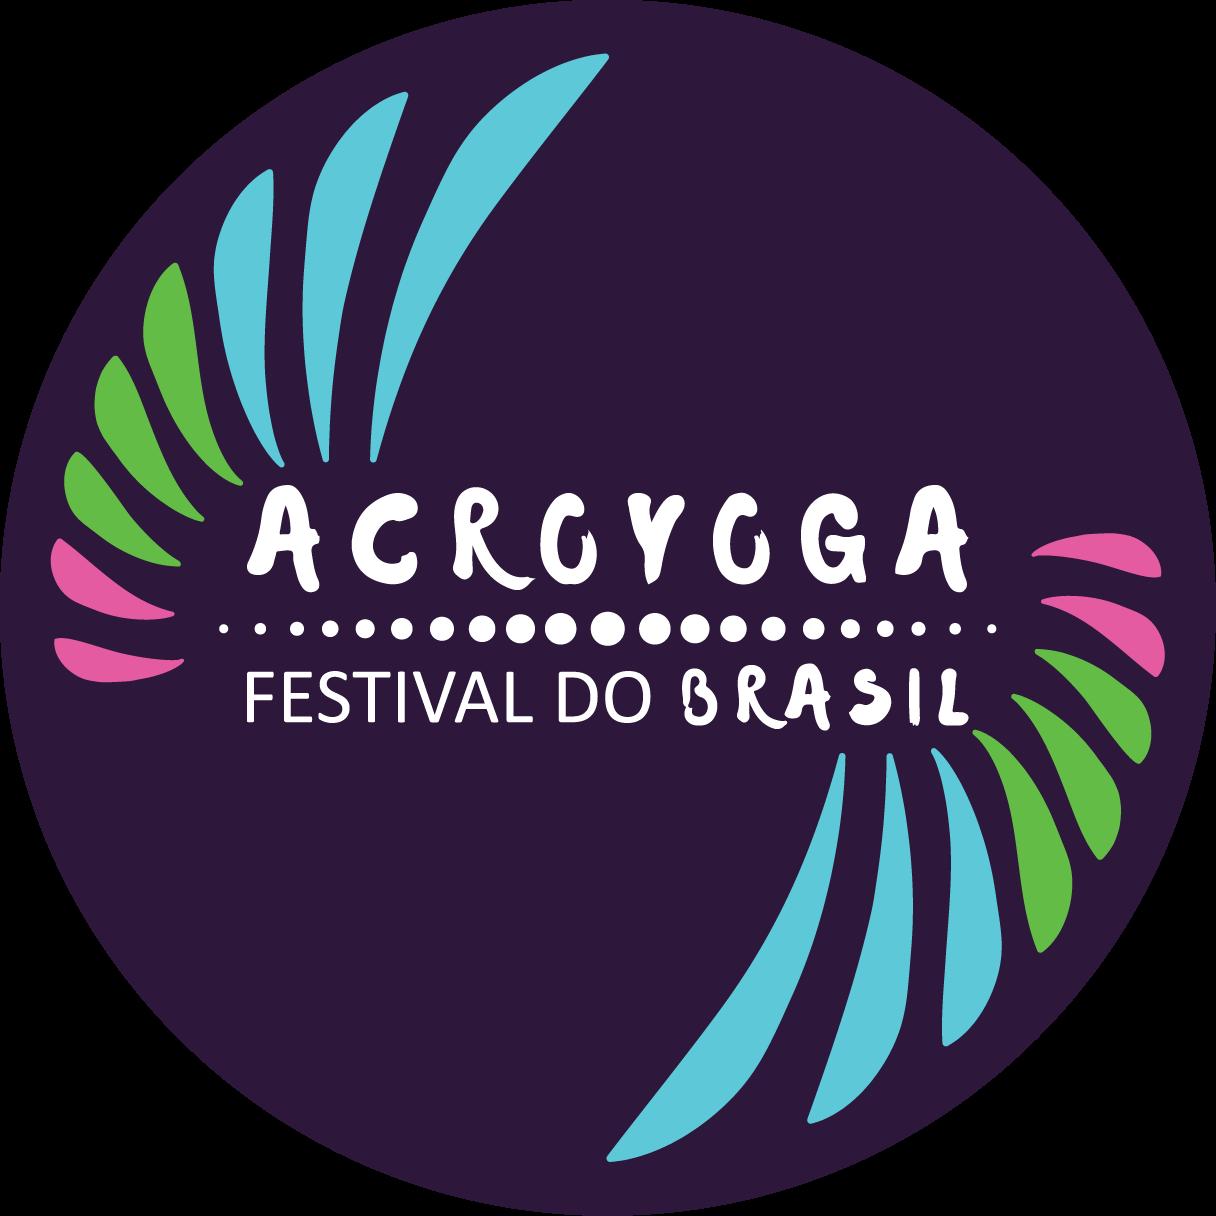 ACROYOGA FESTIVAL DO BRASIL